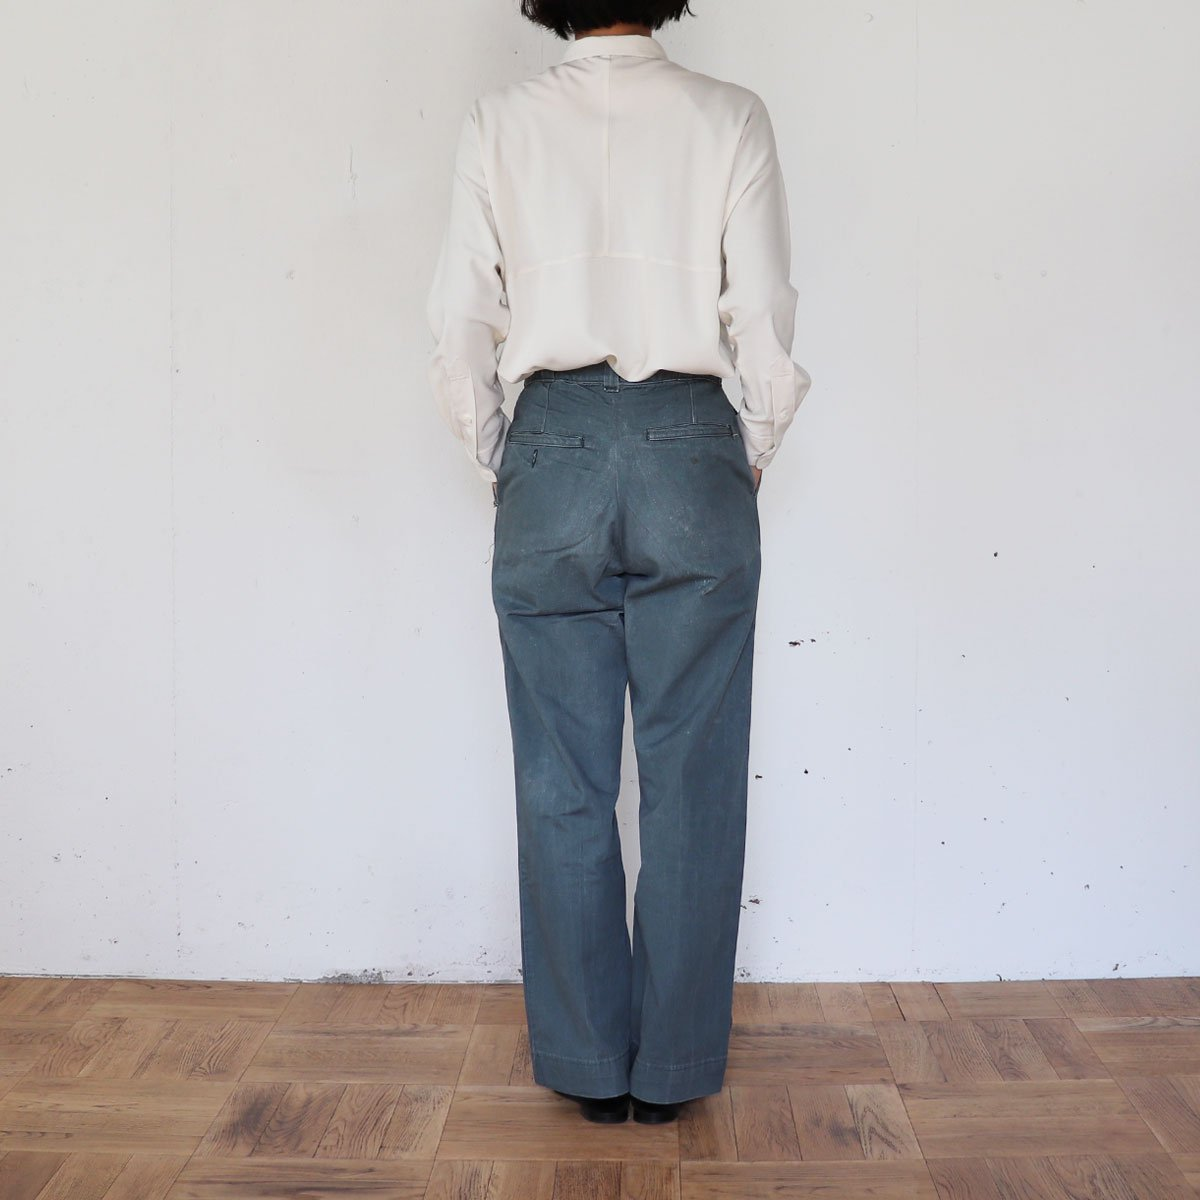 VINTAGE CHINO PANTS 詳細画像6